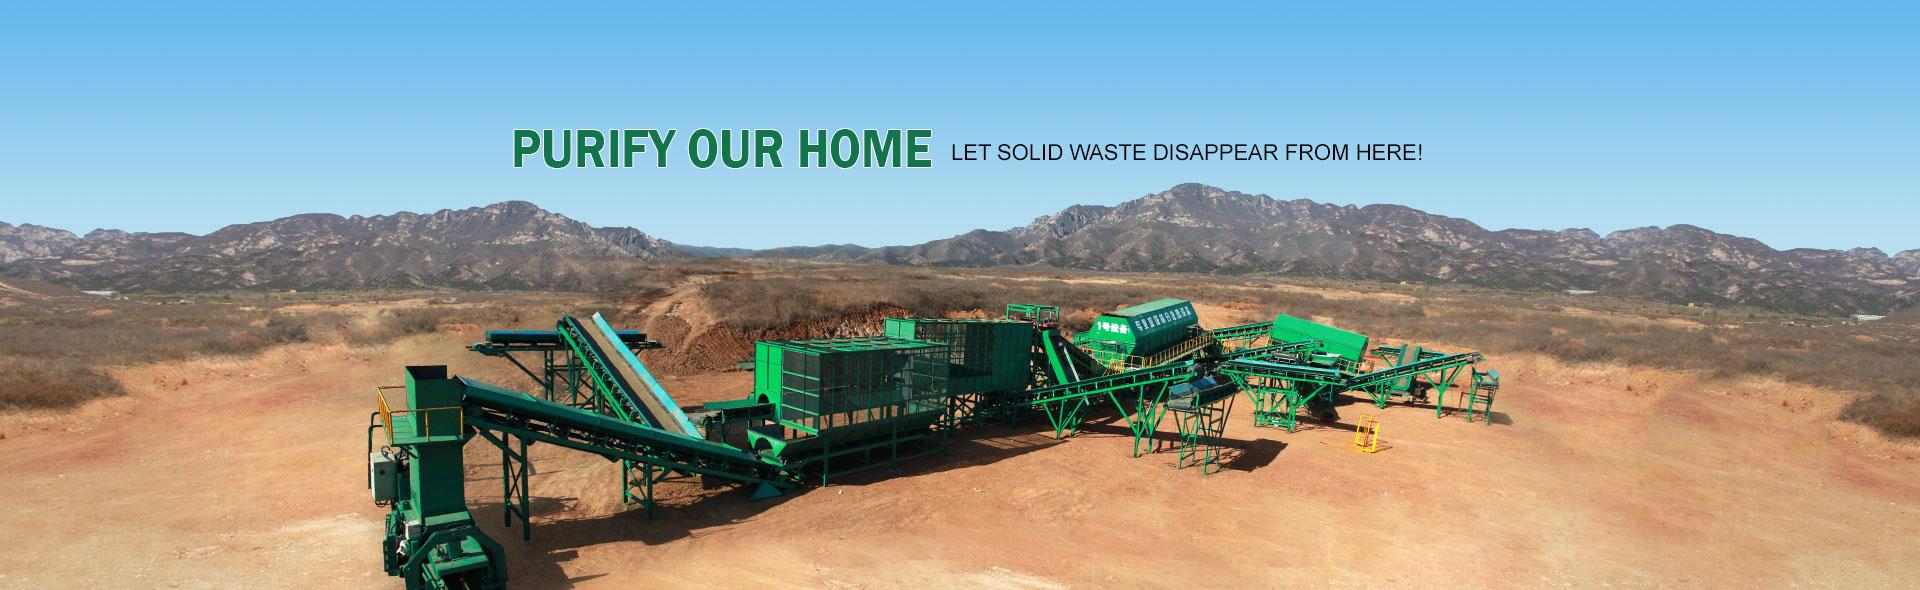 Landfill disposal enterprise